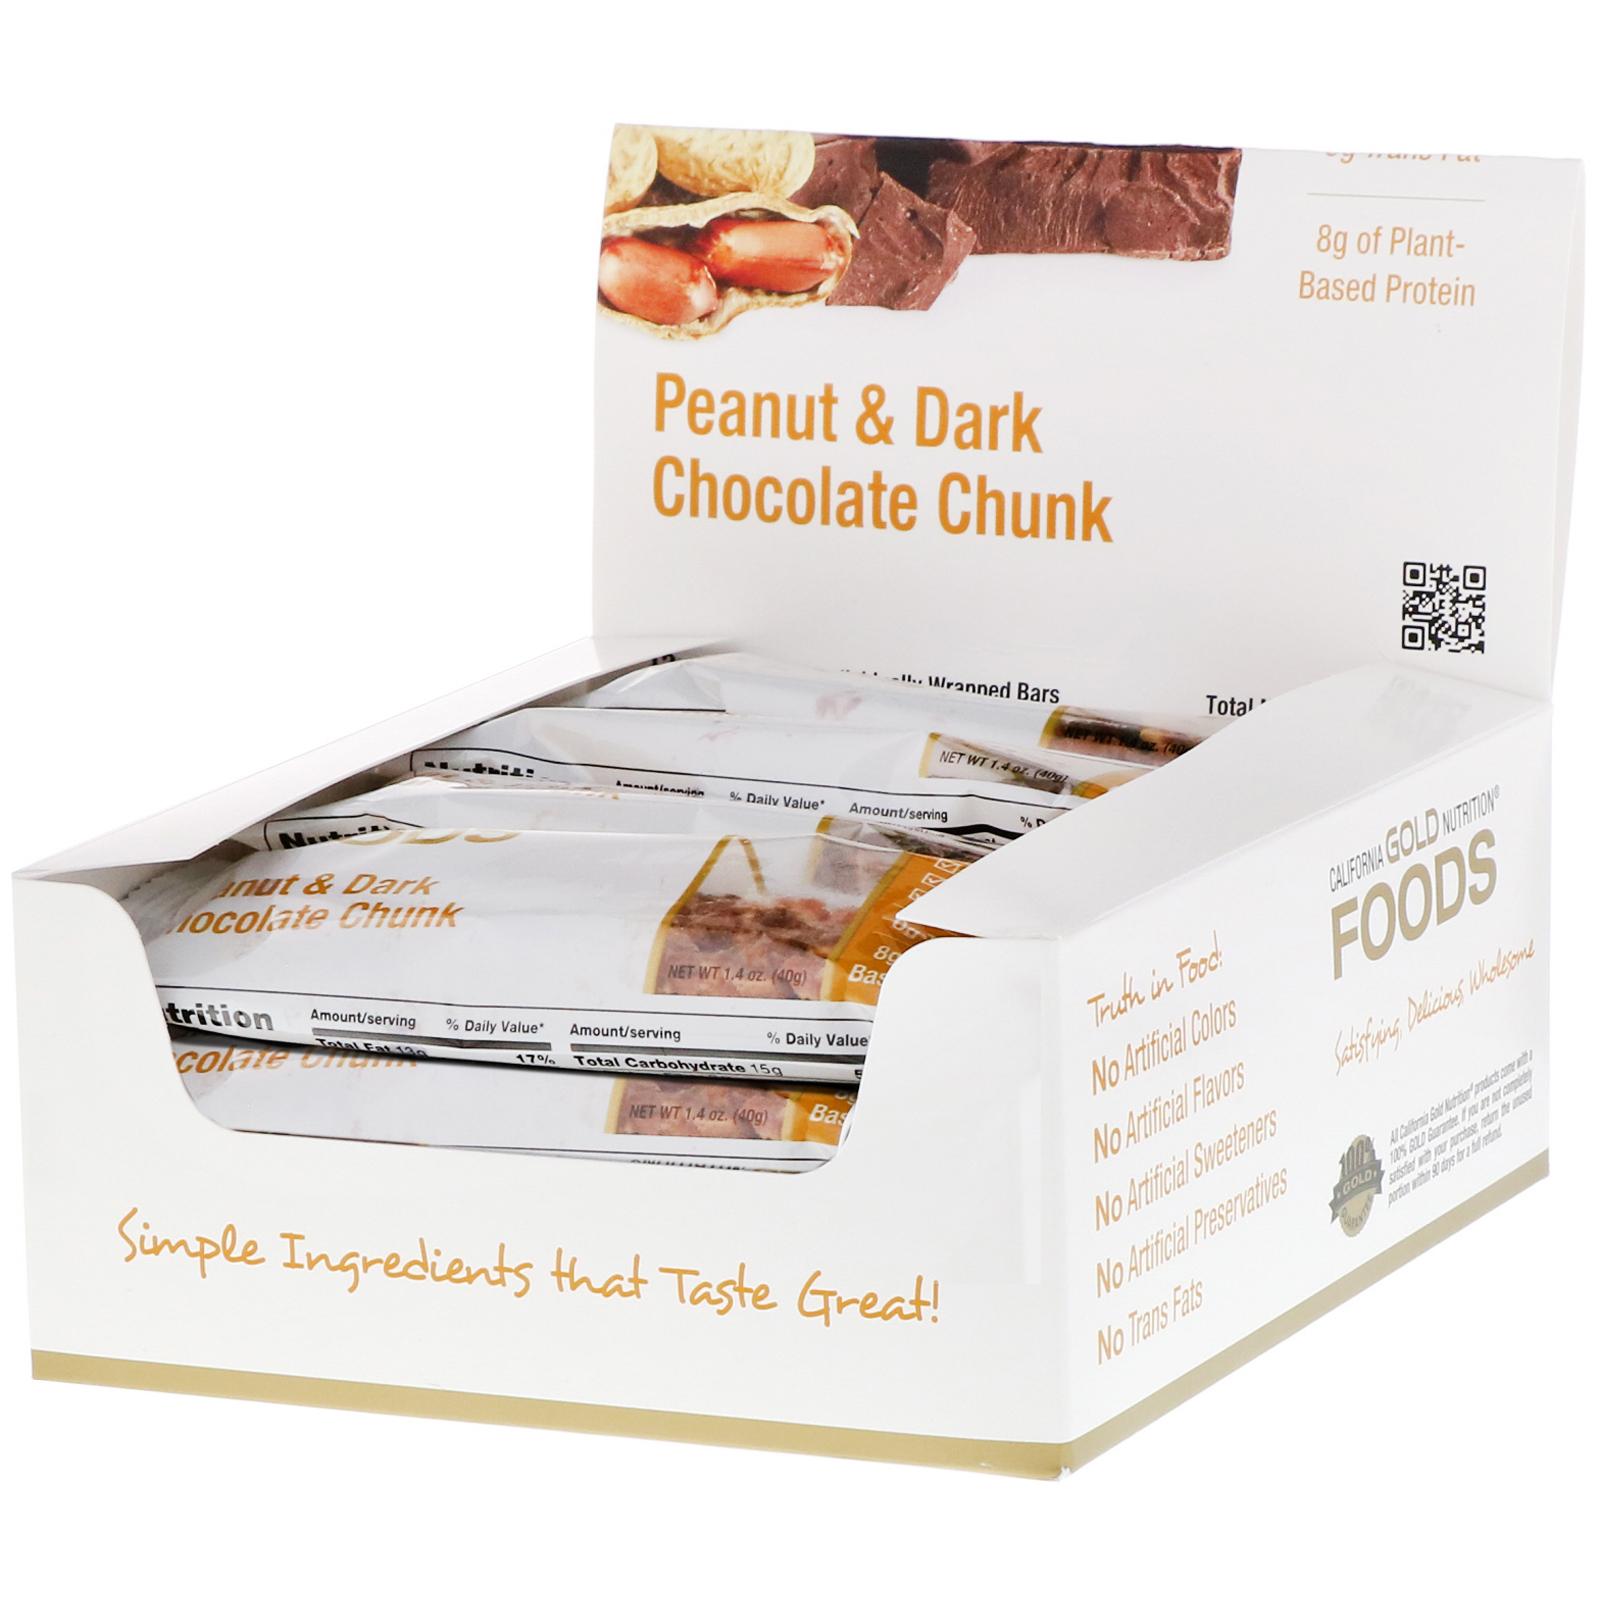 California Gold Nutrition Foods Peanut Dark Chocolate